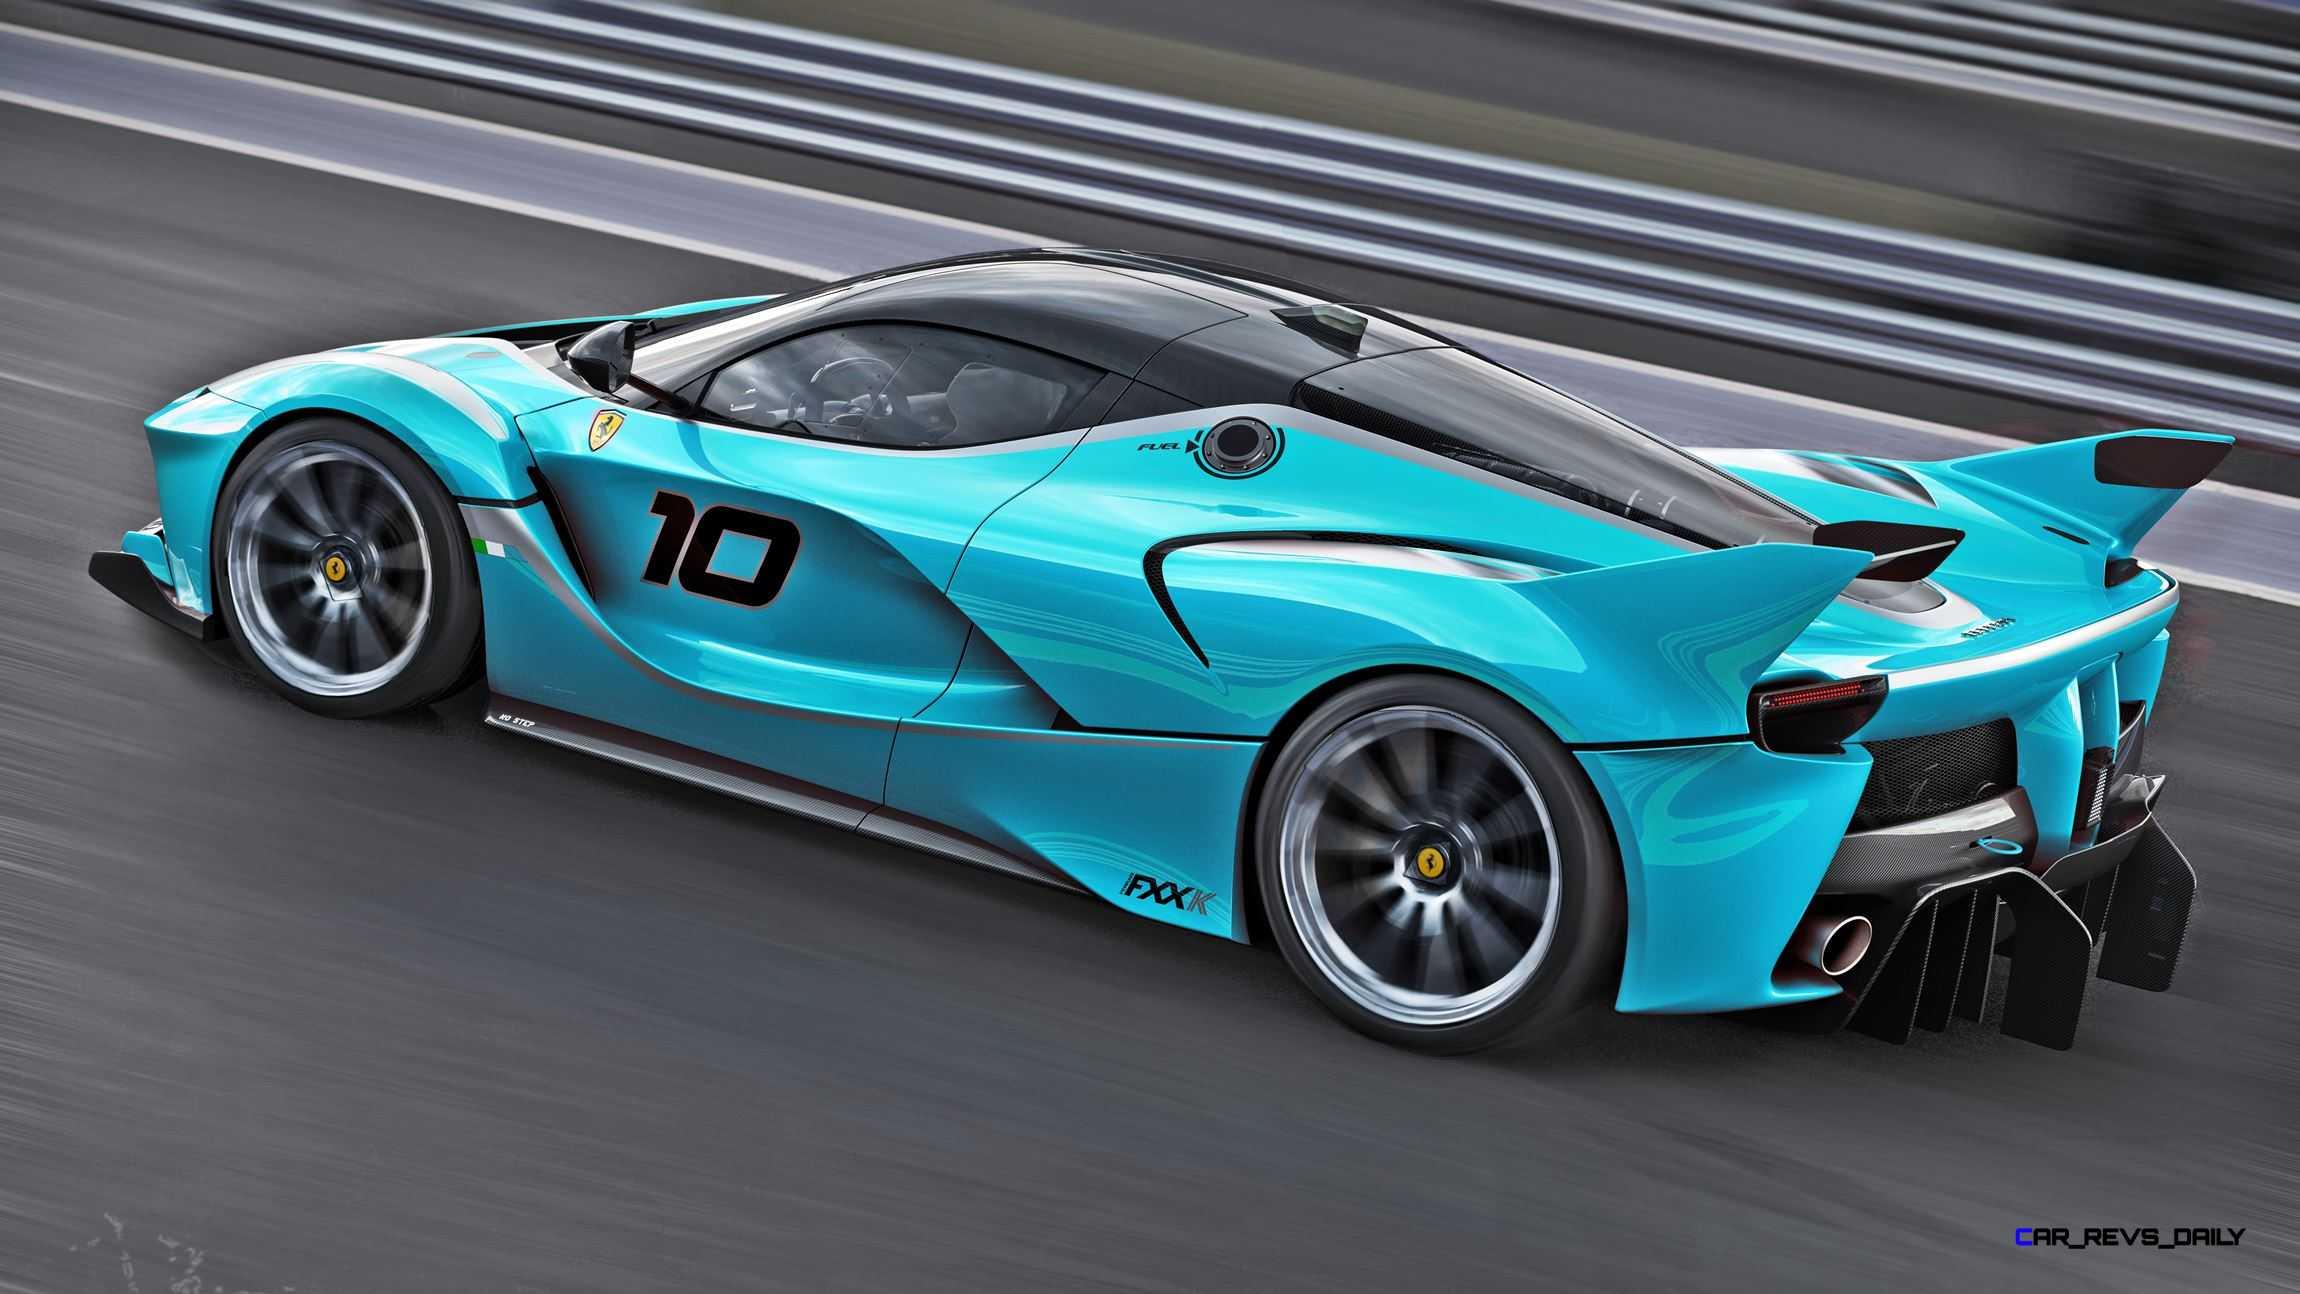 2015 Ferrari Fxx K Colors 23231